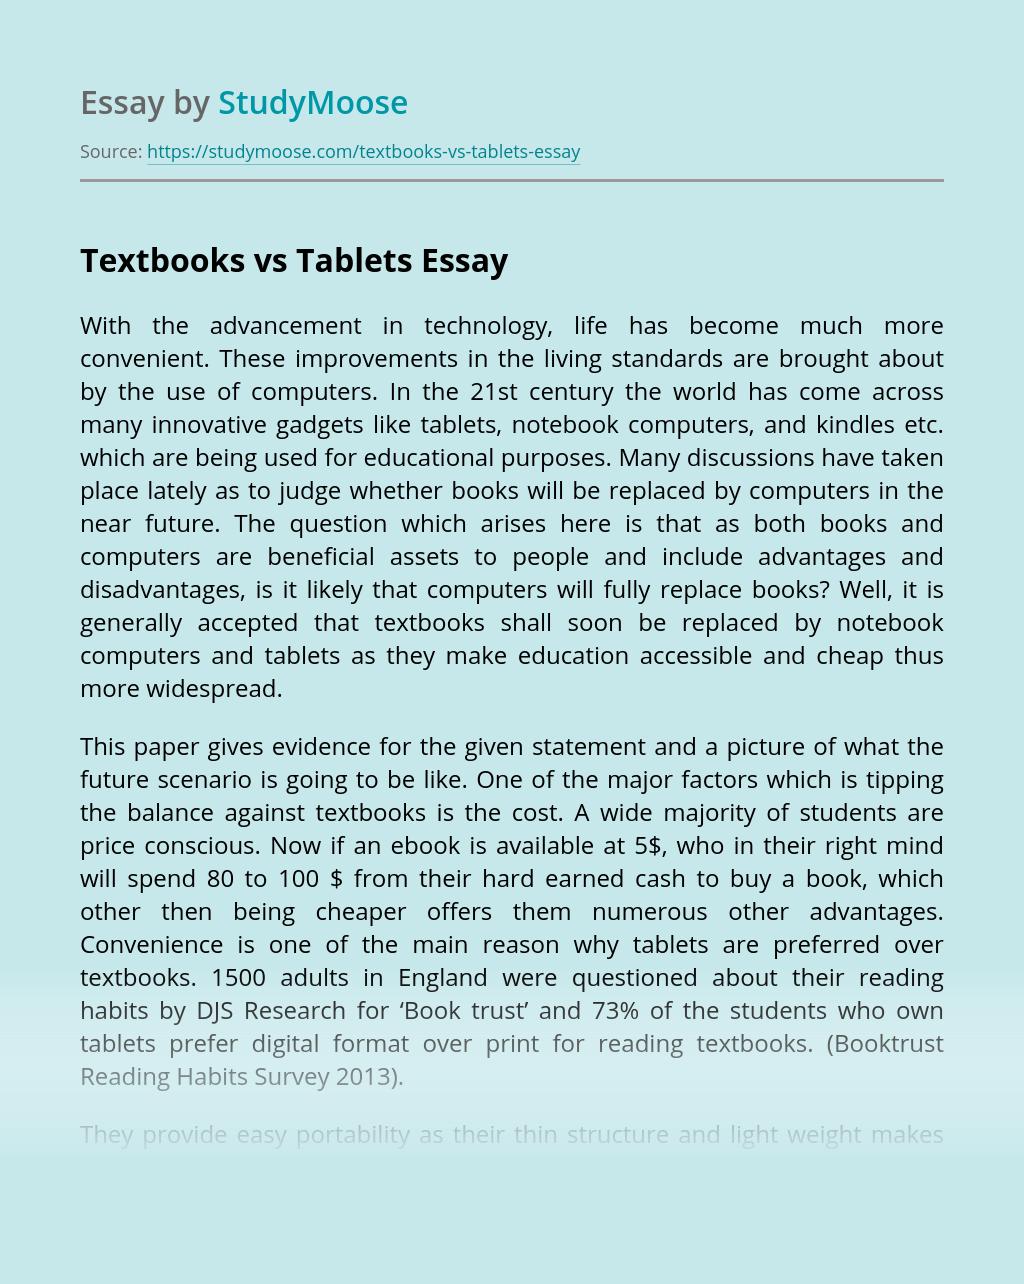 Textbooks vs Tablets